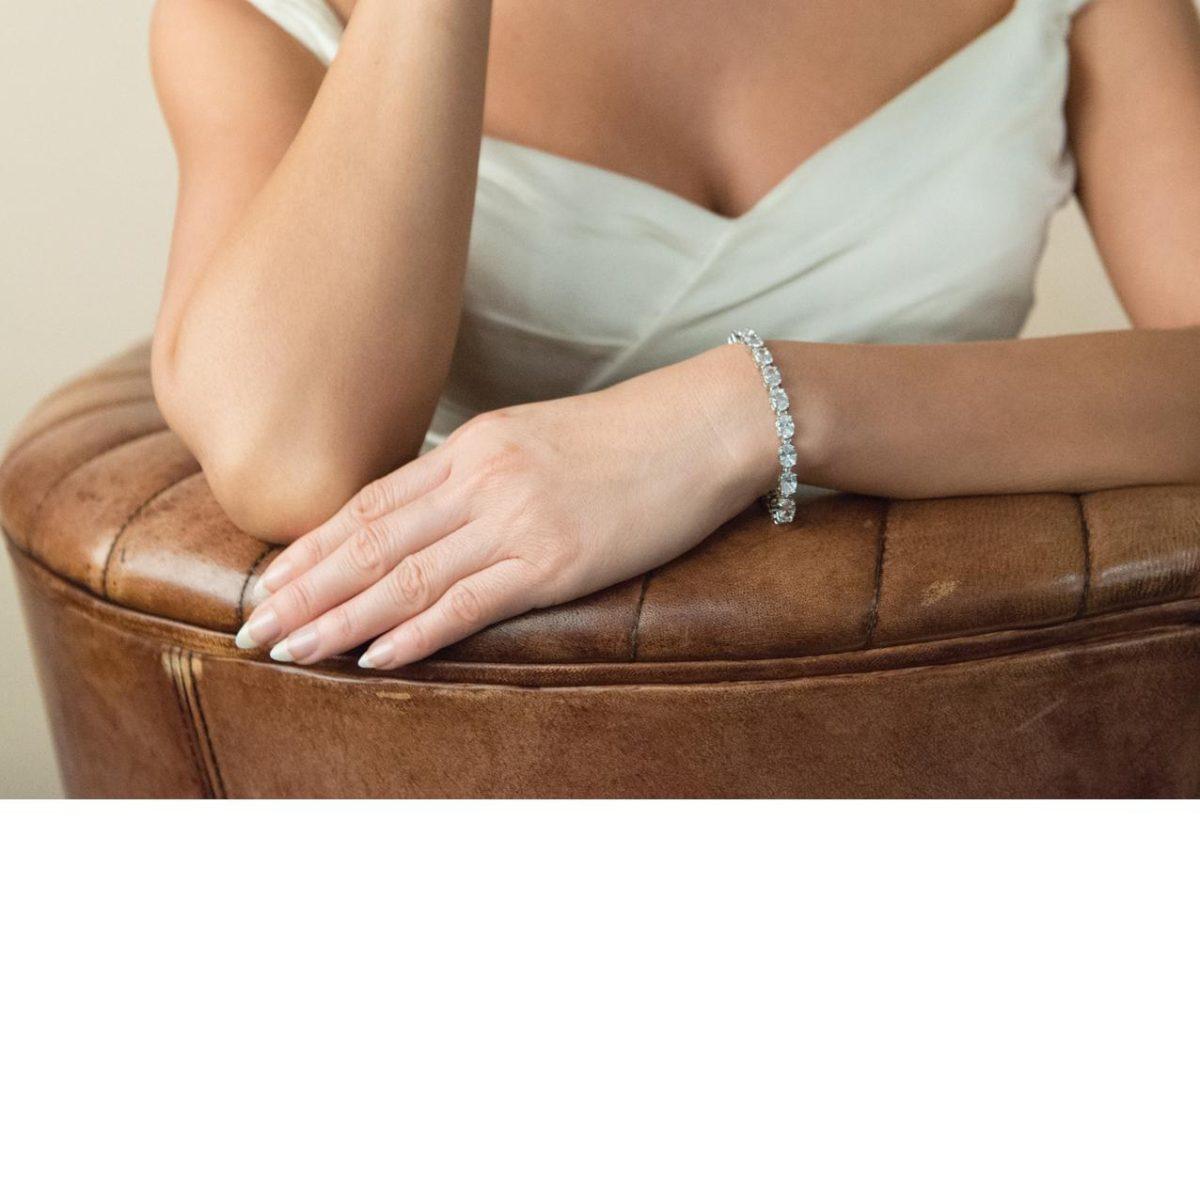 Ivory and Co Rapture Bracelet